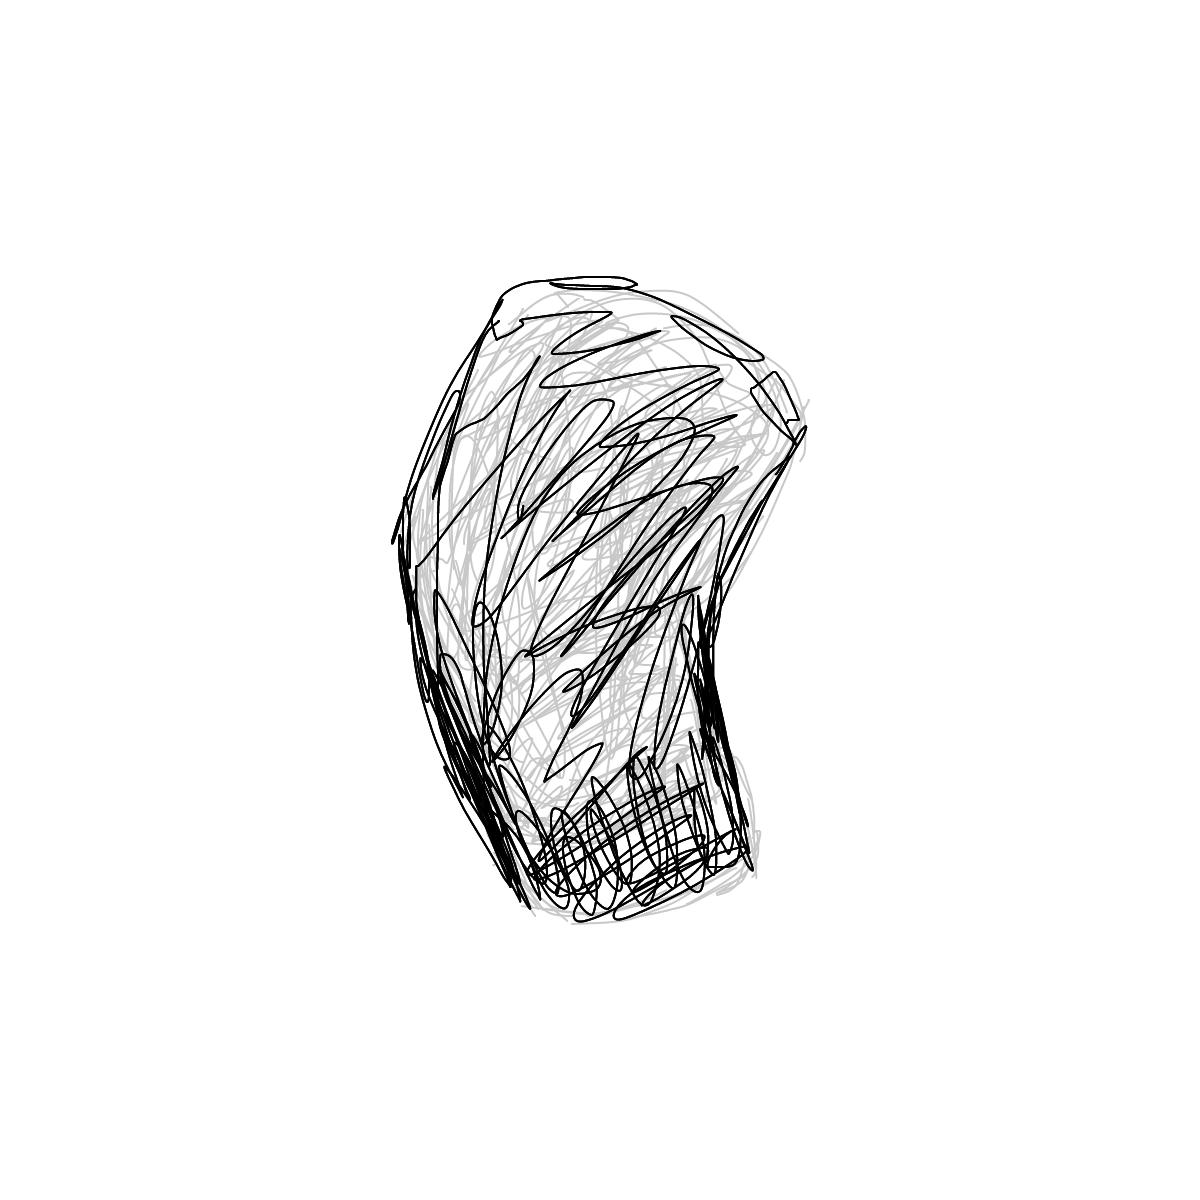 BAAAM drawing#18211 lat:32.9991683959960940lng: -96.7087402343750000